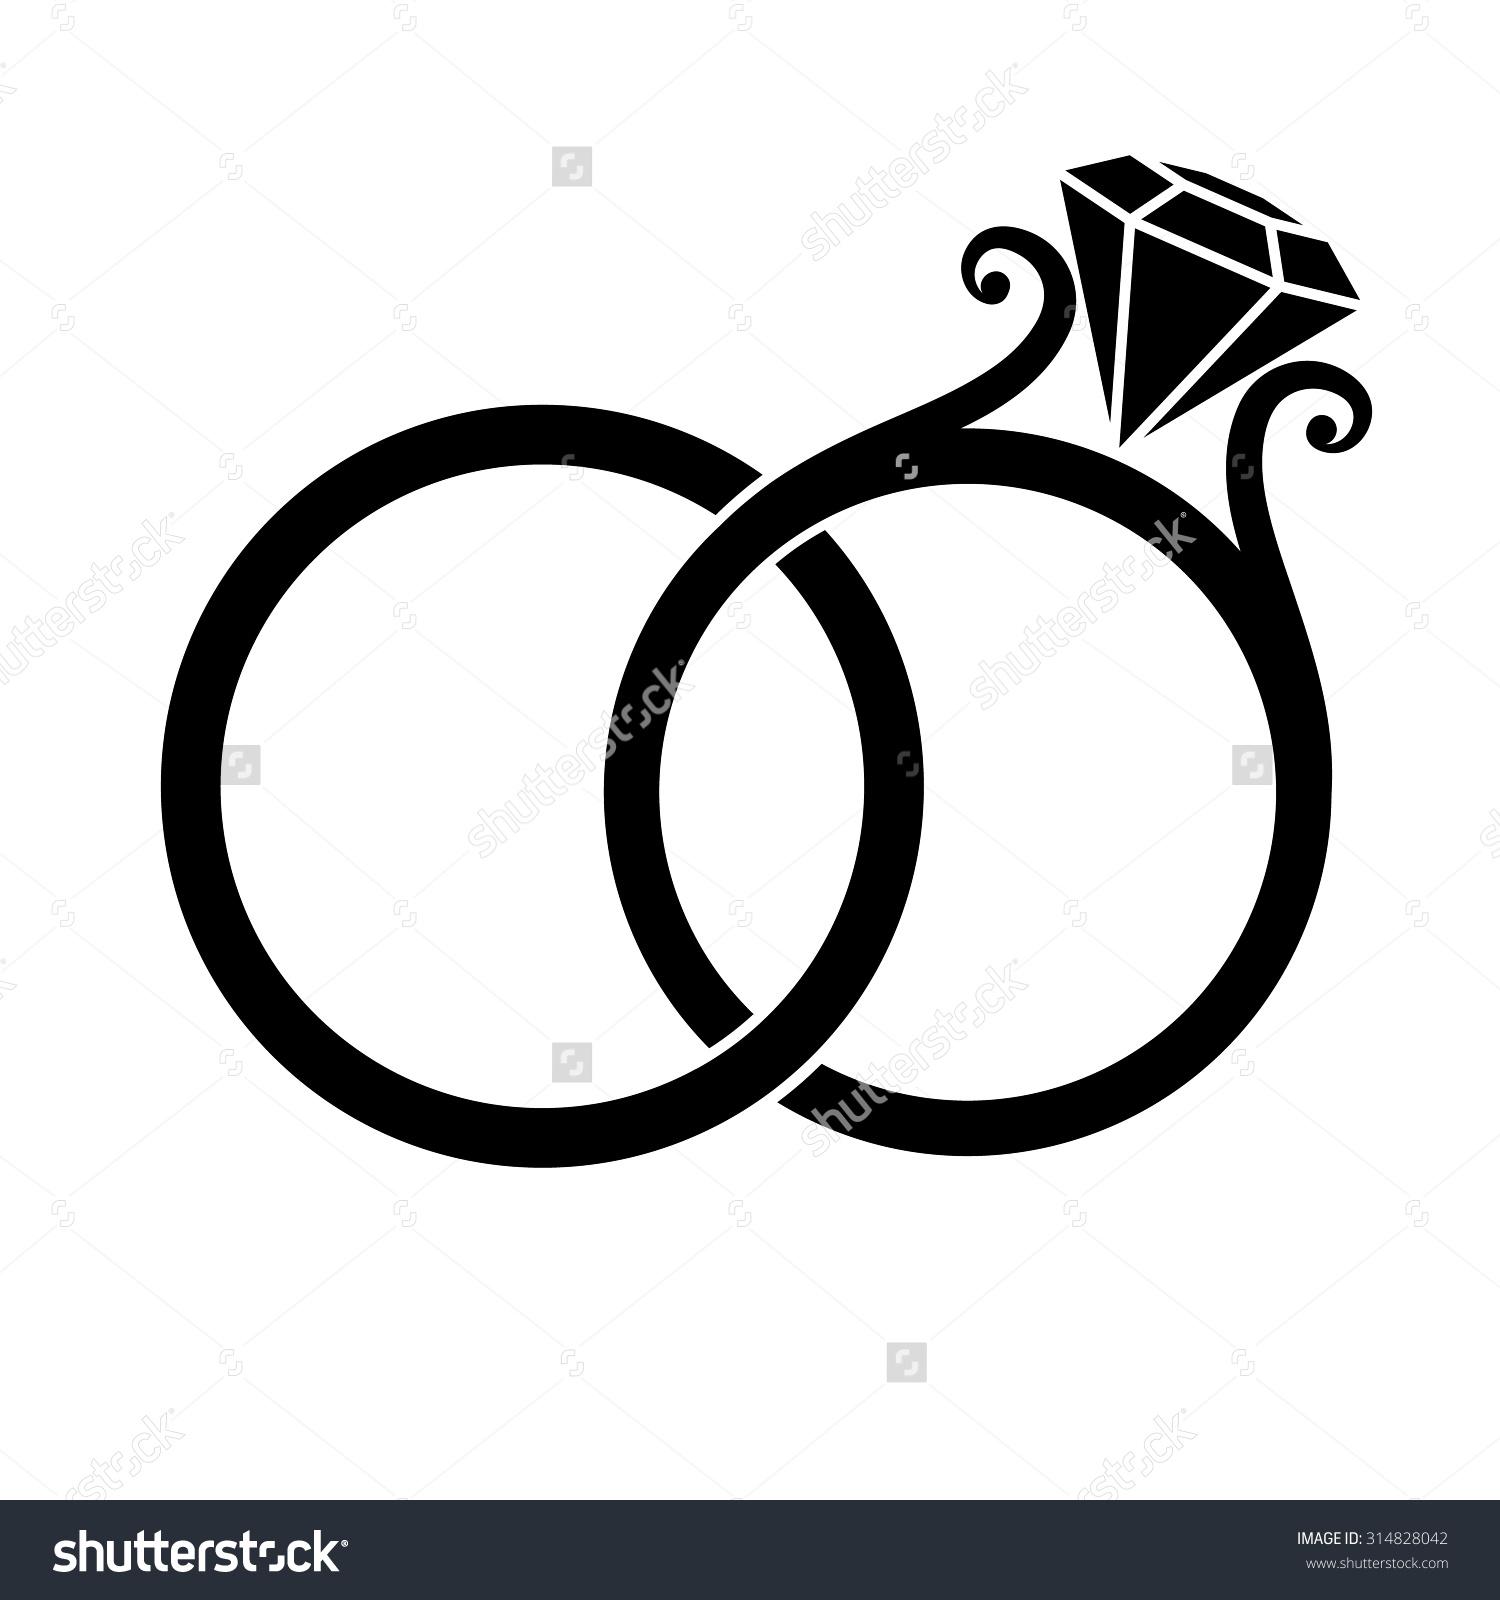 cross with wedding rings